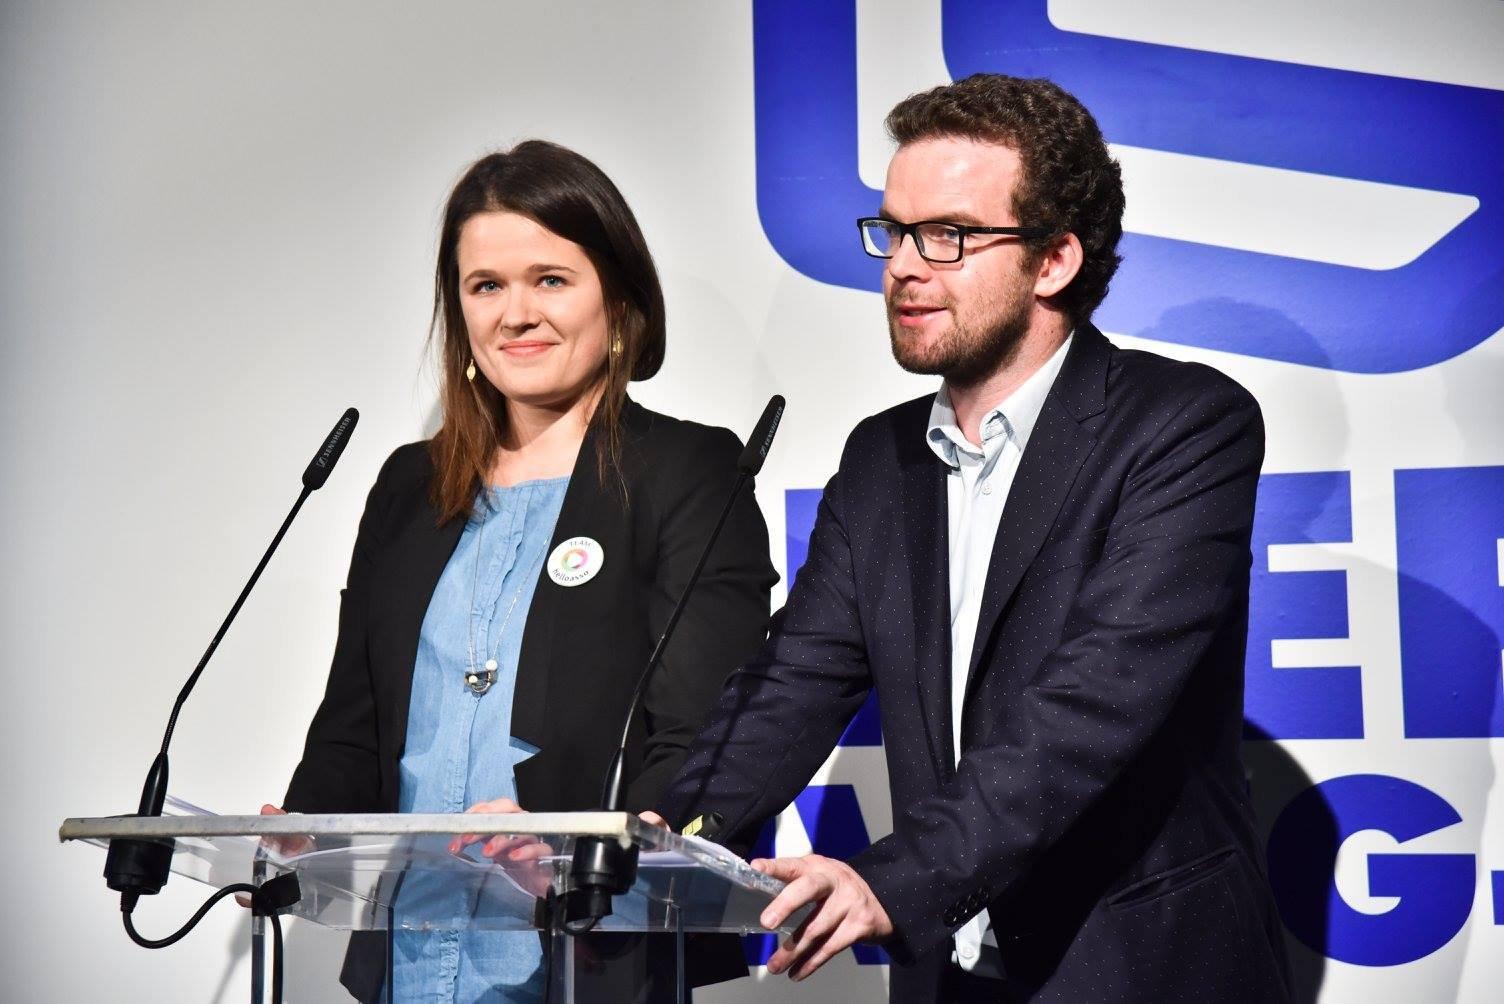 Ismaël Le Mouël et Léa Thomassin inaugurent la Social Good Week 2016